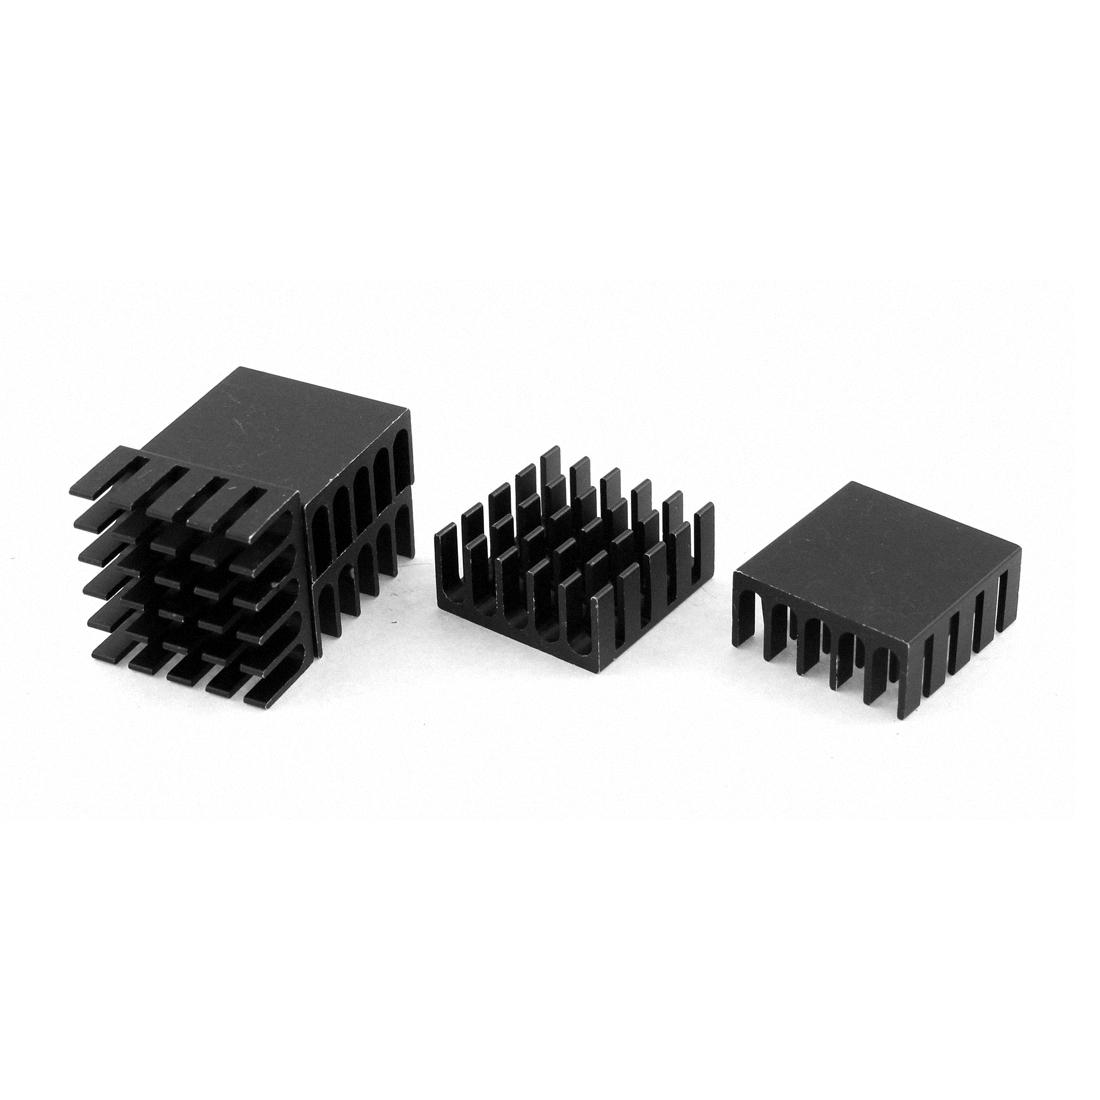 Power Amplifier Transistor IC FET Aluminium Heatsink 22 x 22 x 10mm 5 PCS